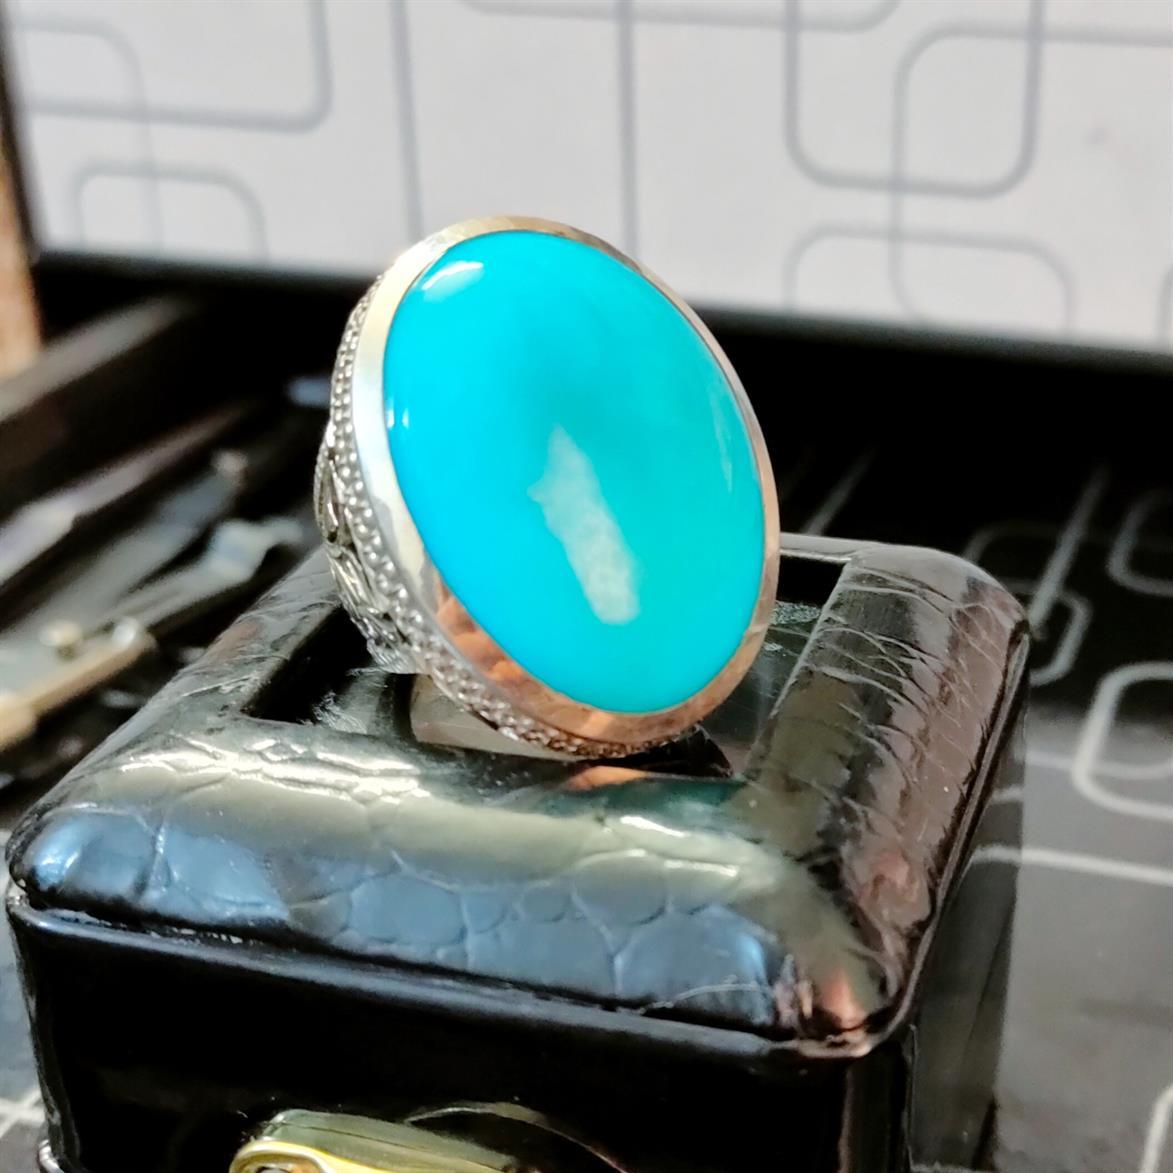 Natural Turquoise Feroza Ring Handmade Nishapur Feroza Ring 3 natural gemstones pakistan + 925 silver jewelry online